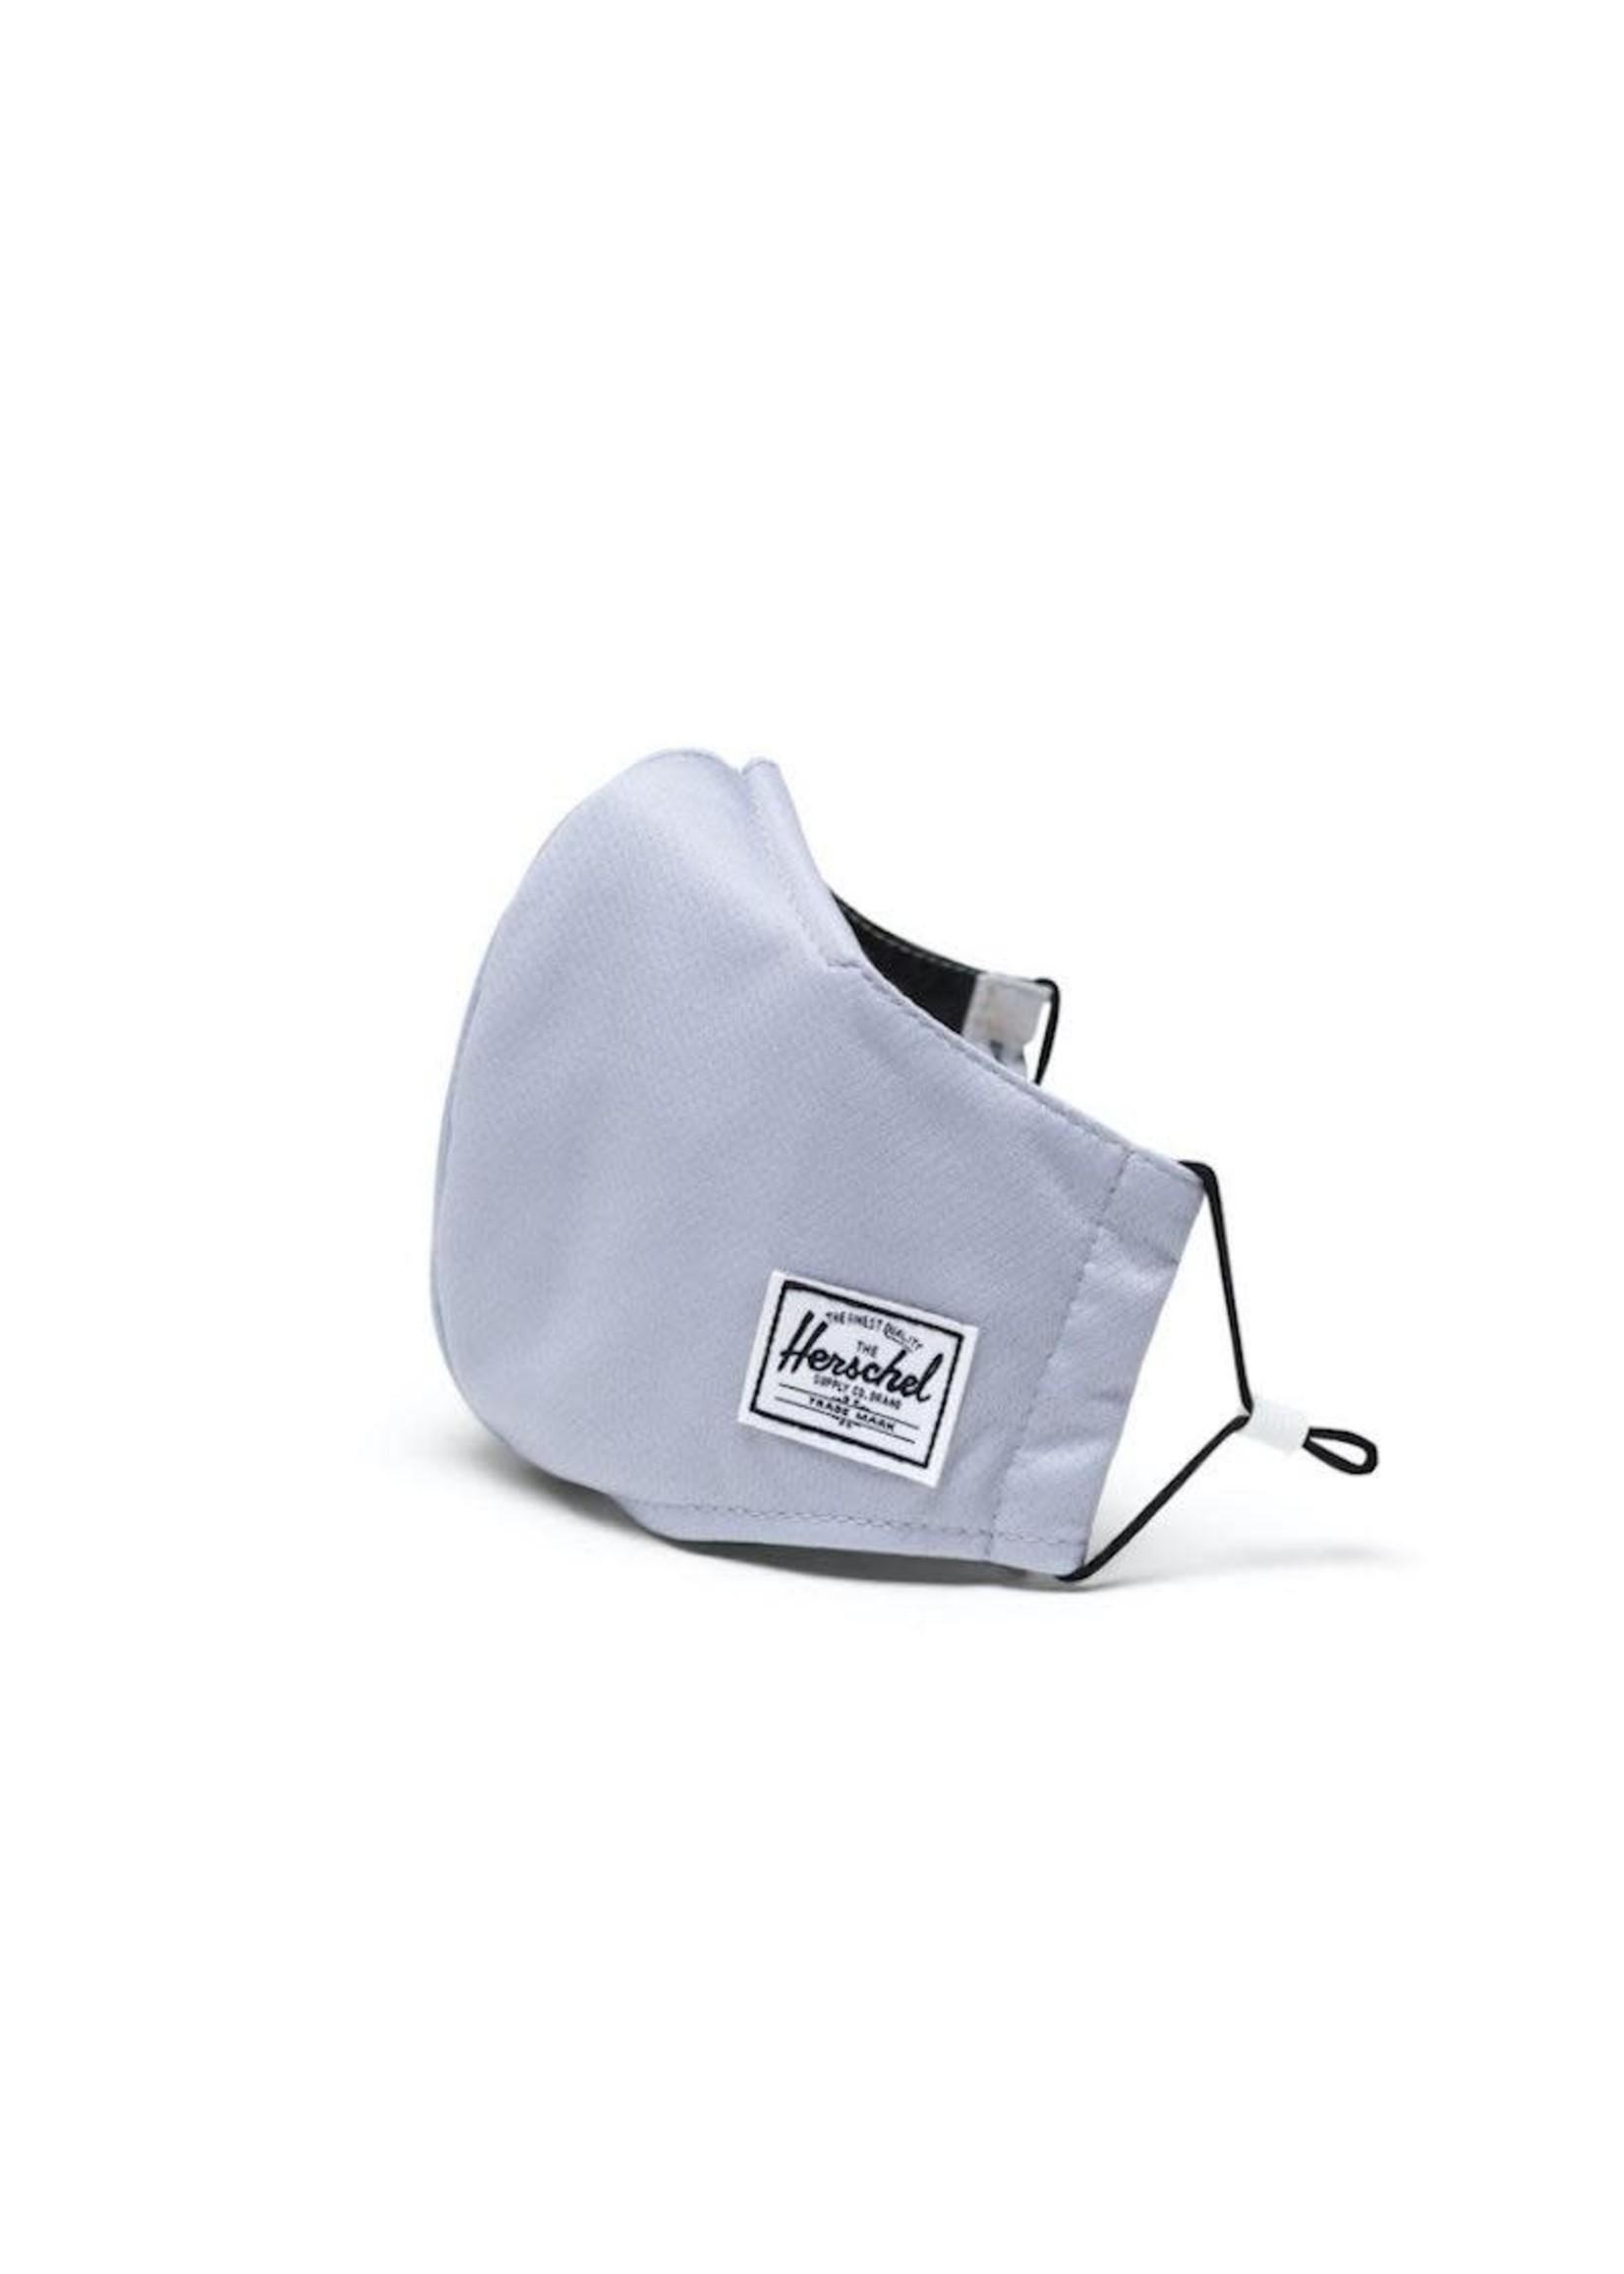 Herschel Supply Co. Herschel Supply, Classic Fitted Face Mask, Adult, Light Grey